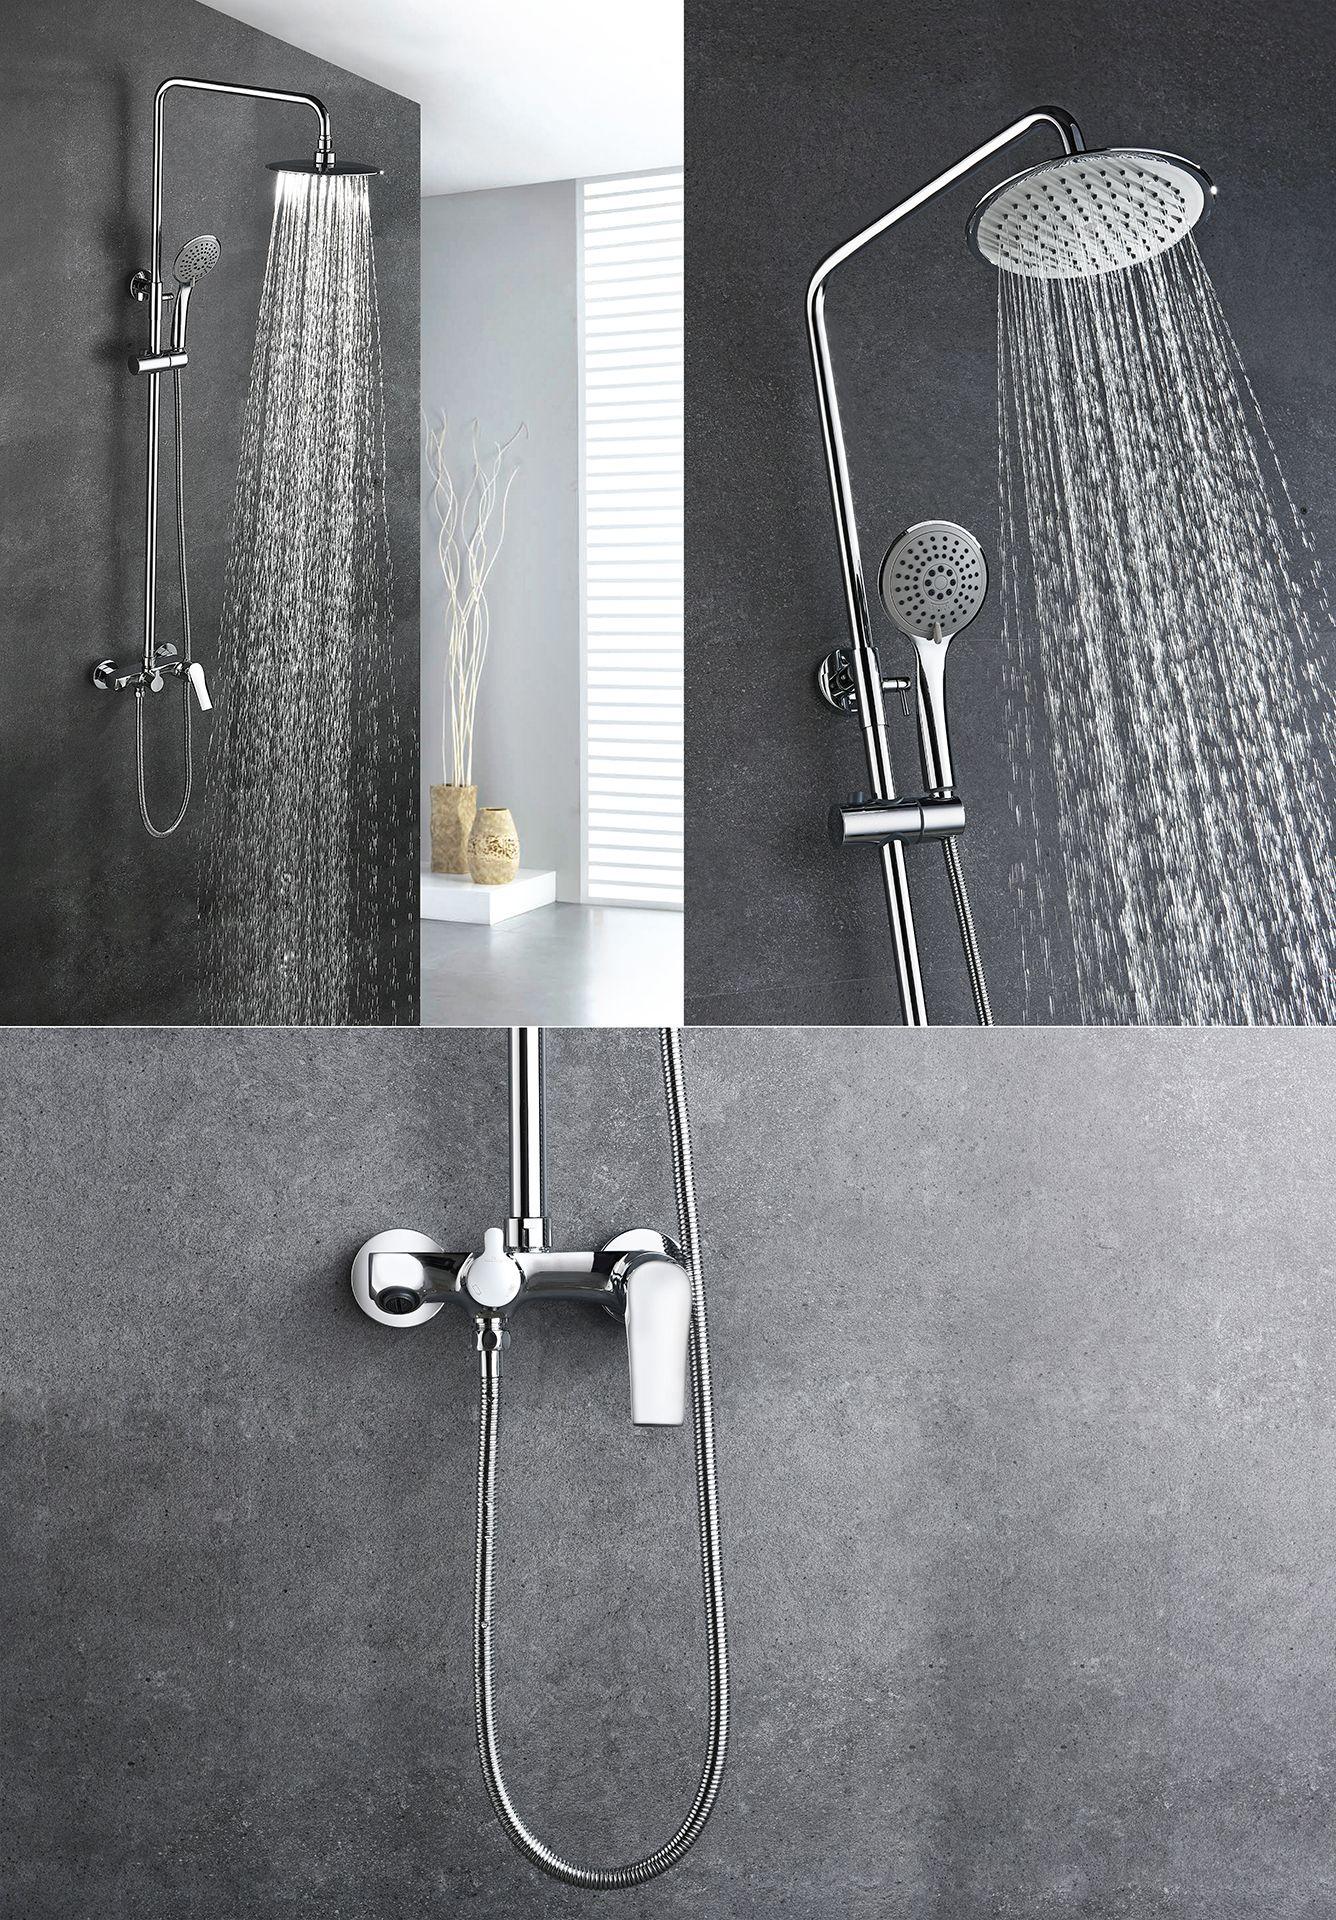 999 Request Failed Shower Set Shower Room Shower